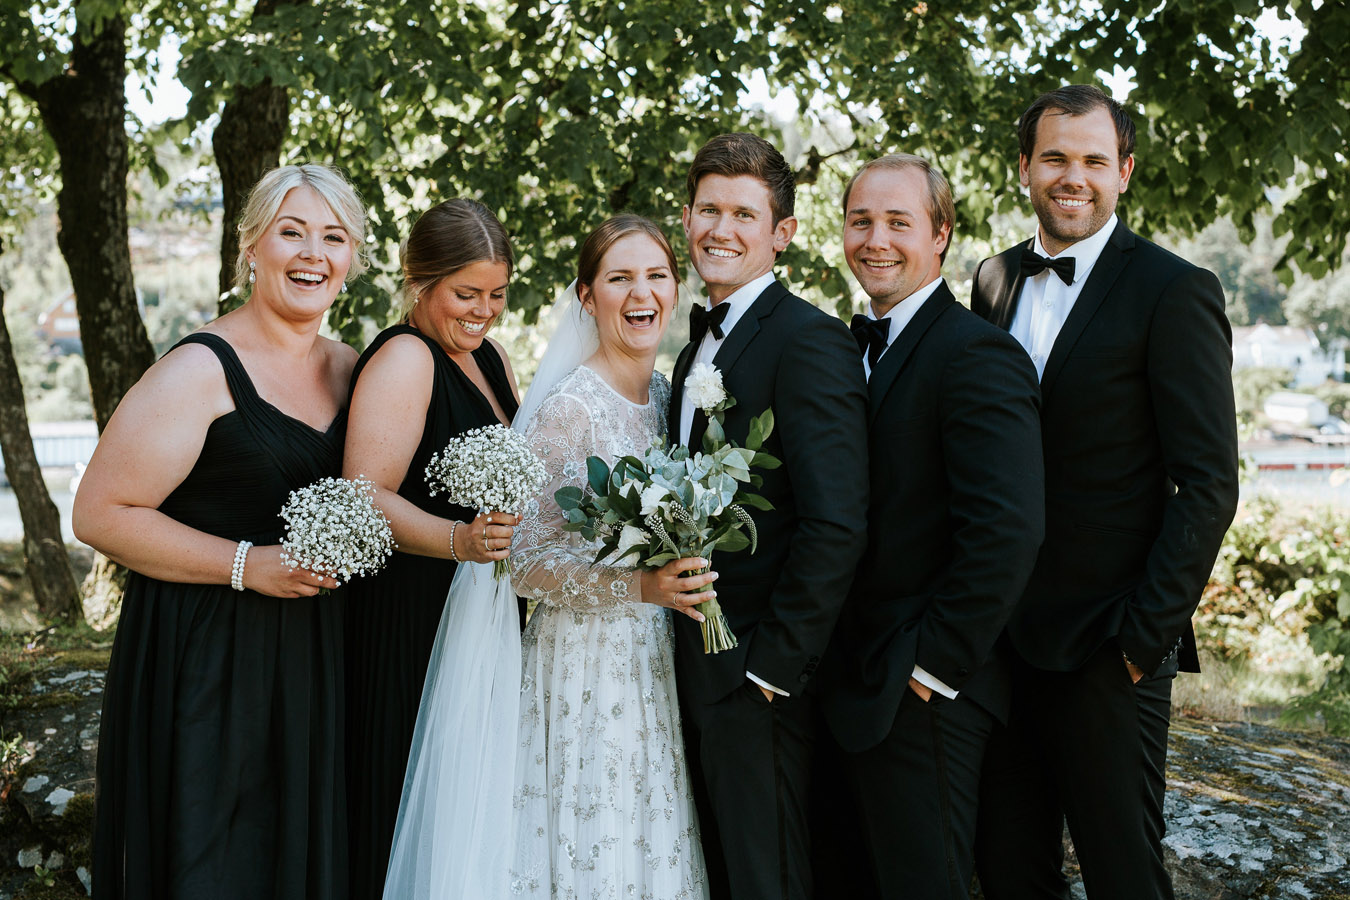 Fotograf-Tone-Tvedt-bryllup-106.jpg